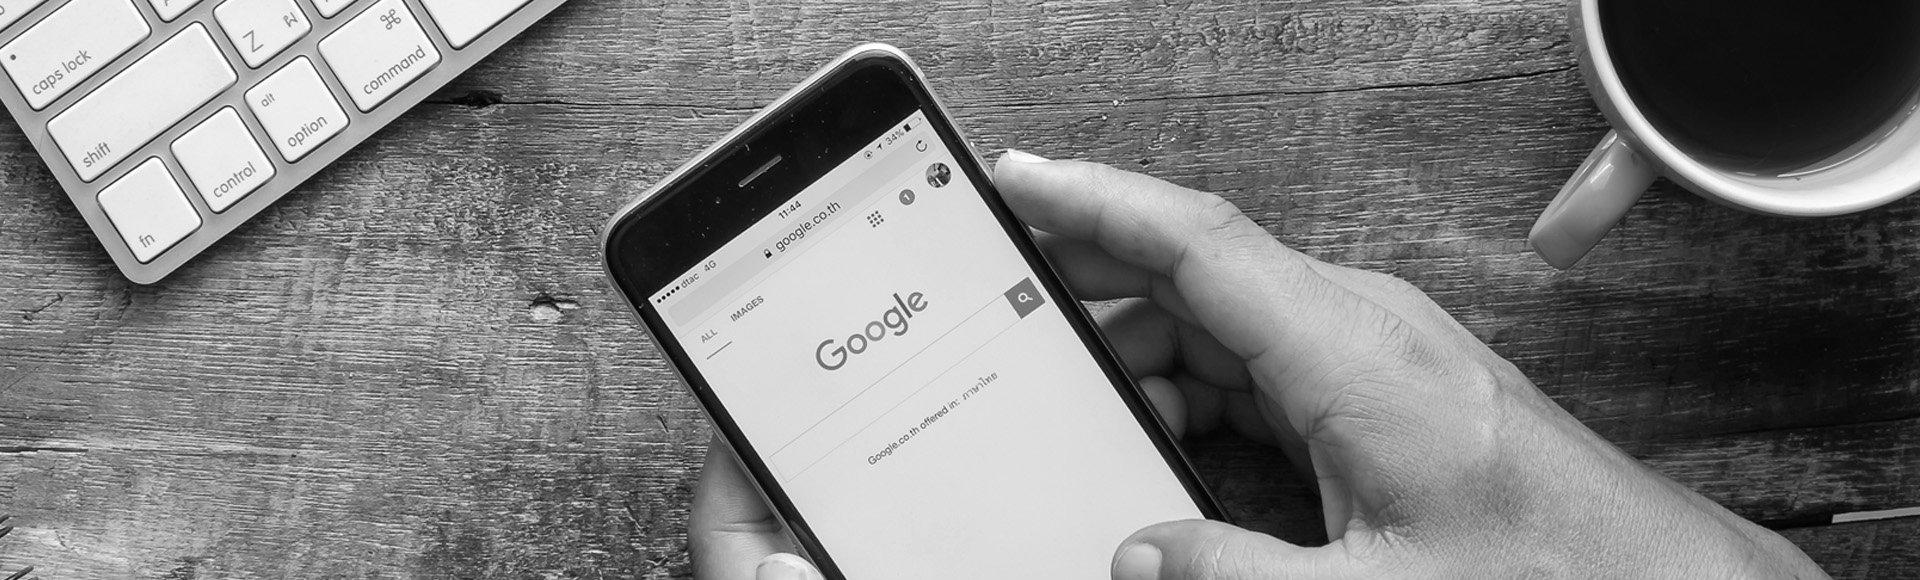 Google-Whitelisting